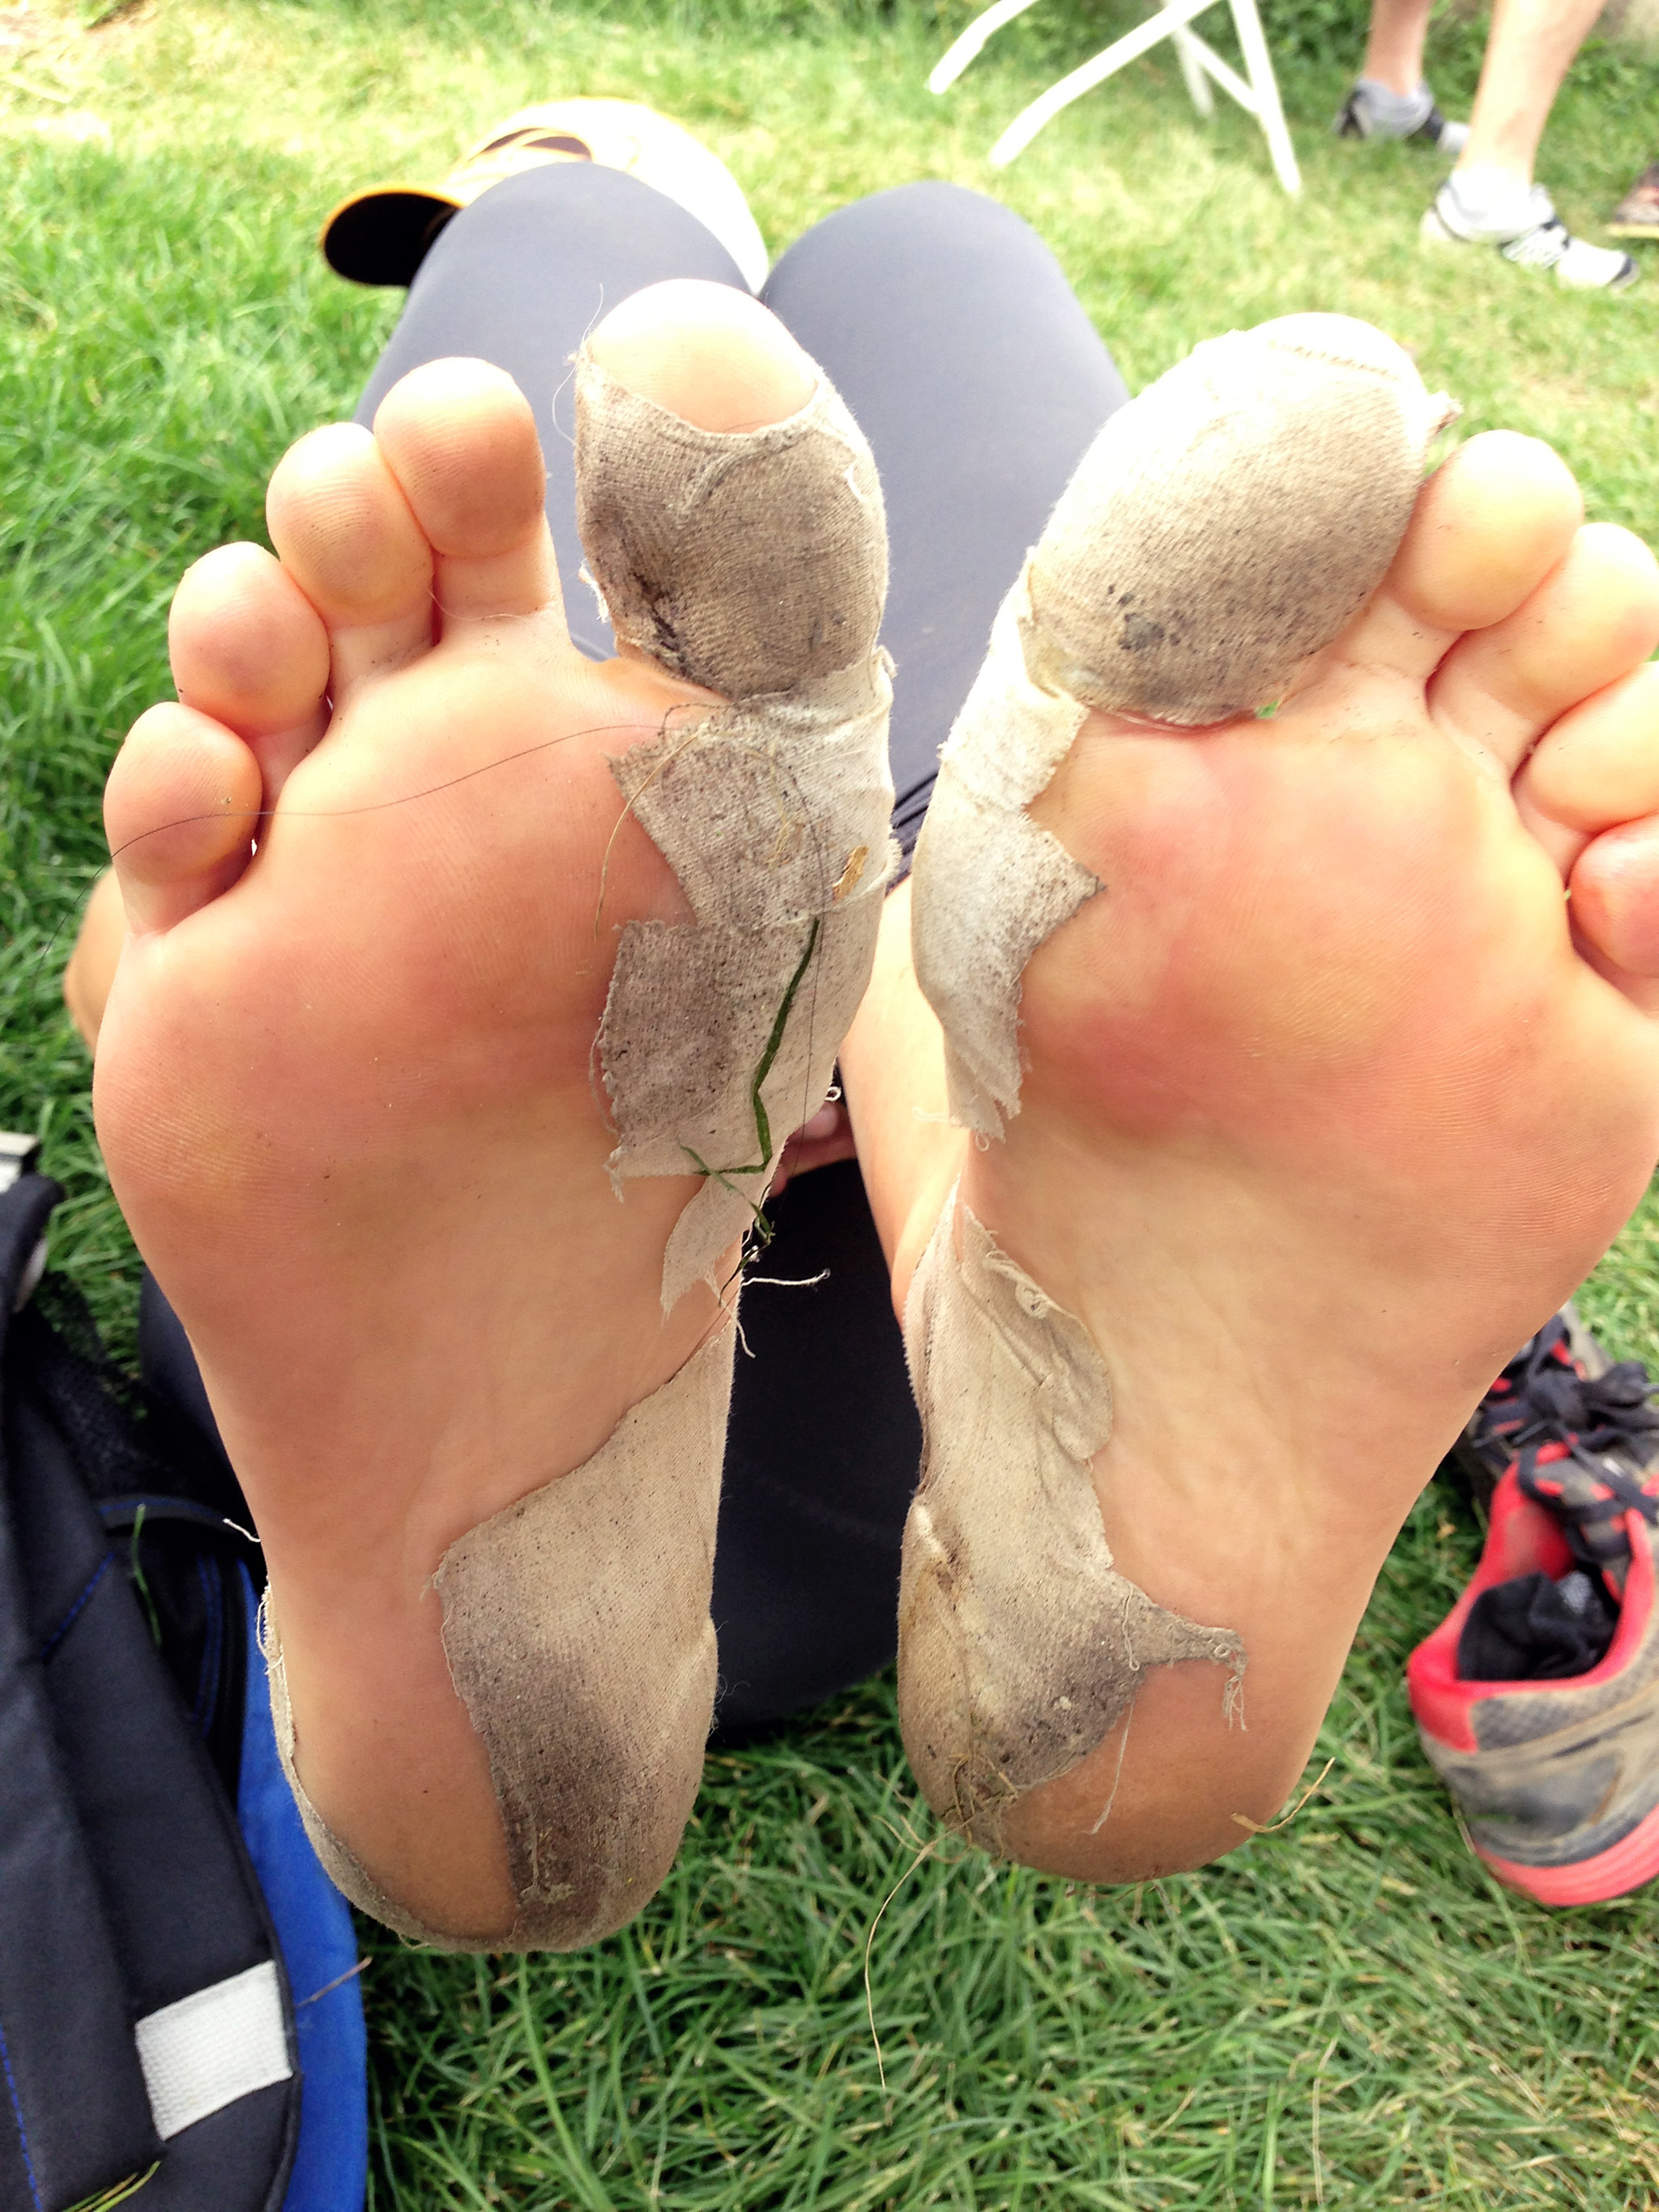 Feted - Leadville 100 Ultramarathon - ESPN